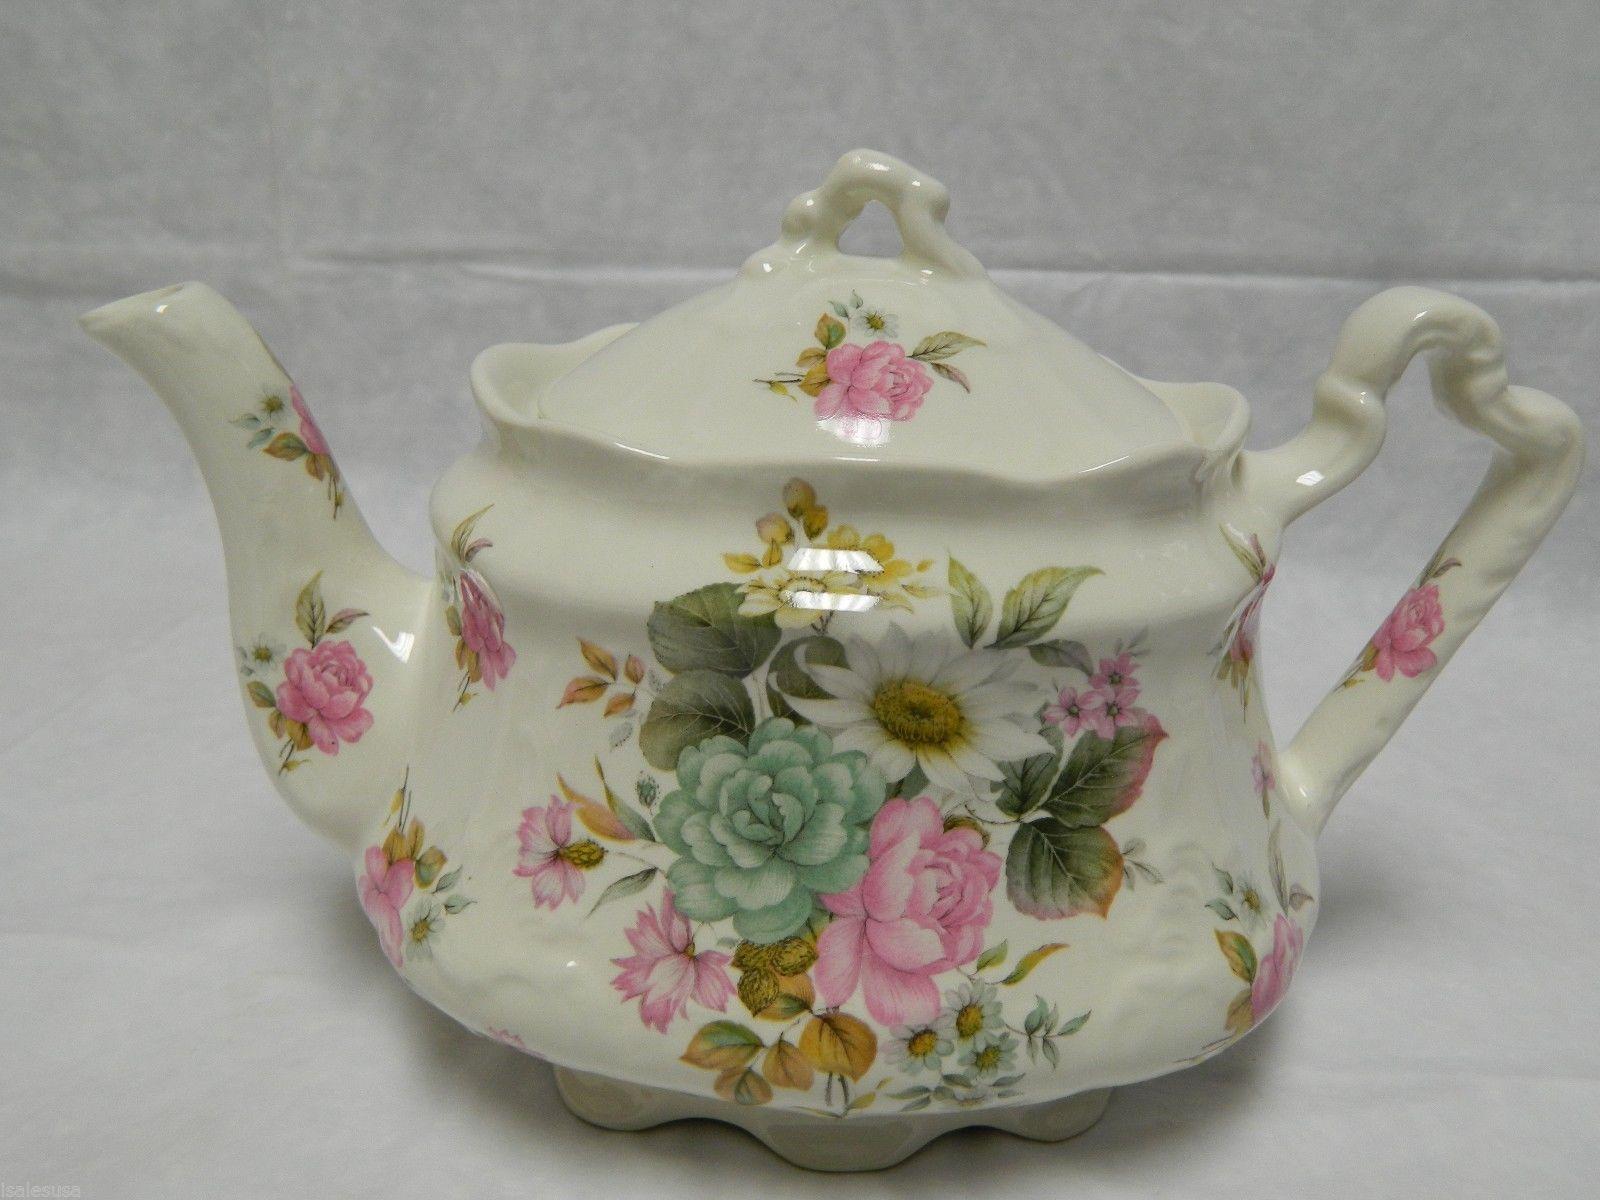 Beautiful Vintage Arthur Wood Tea Pot Made in England | eBay